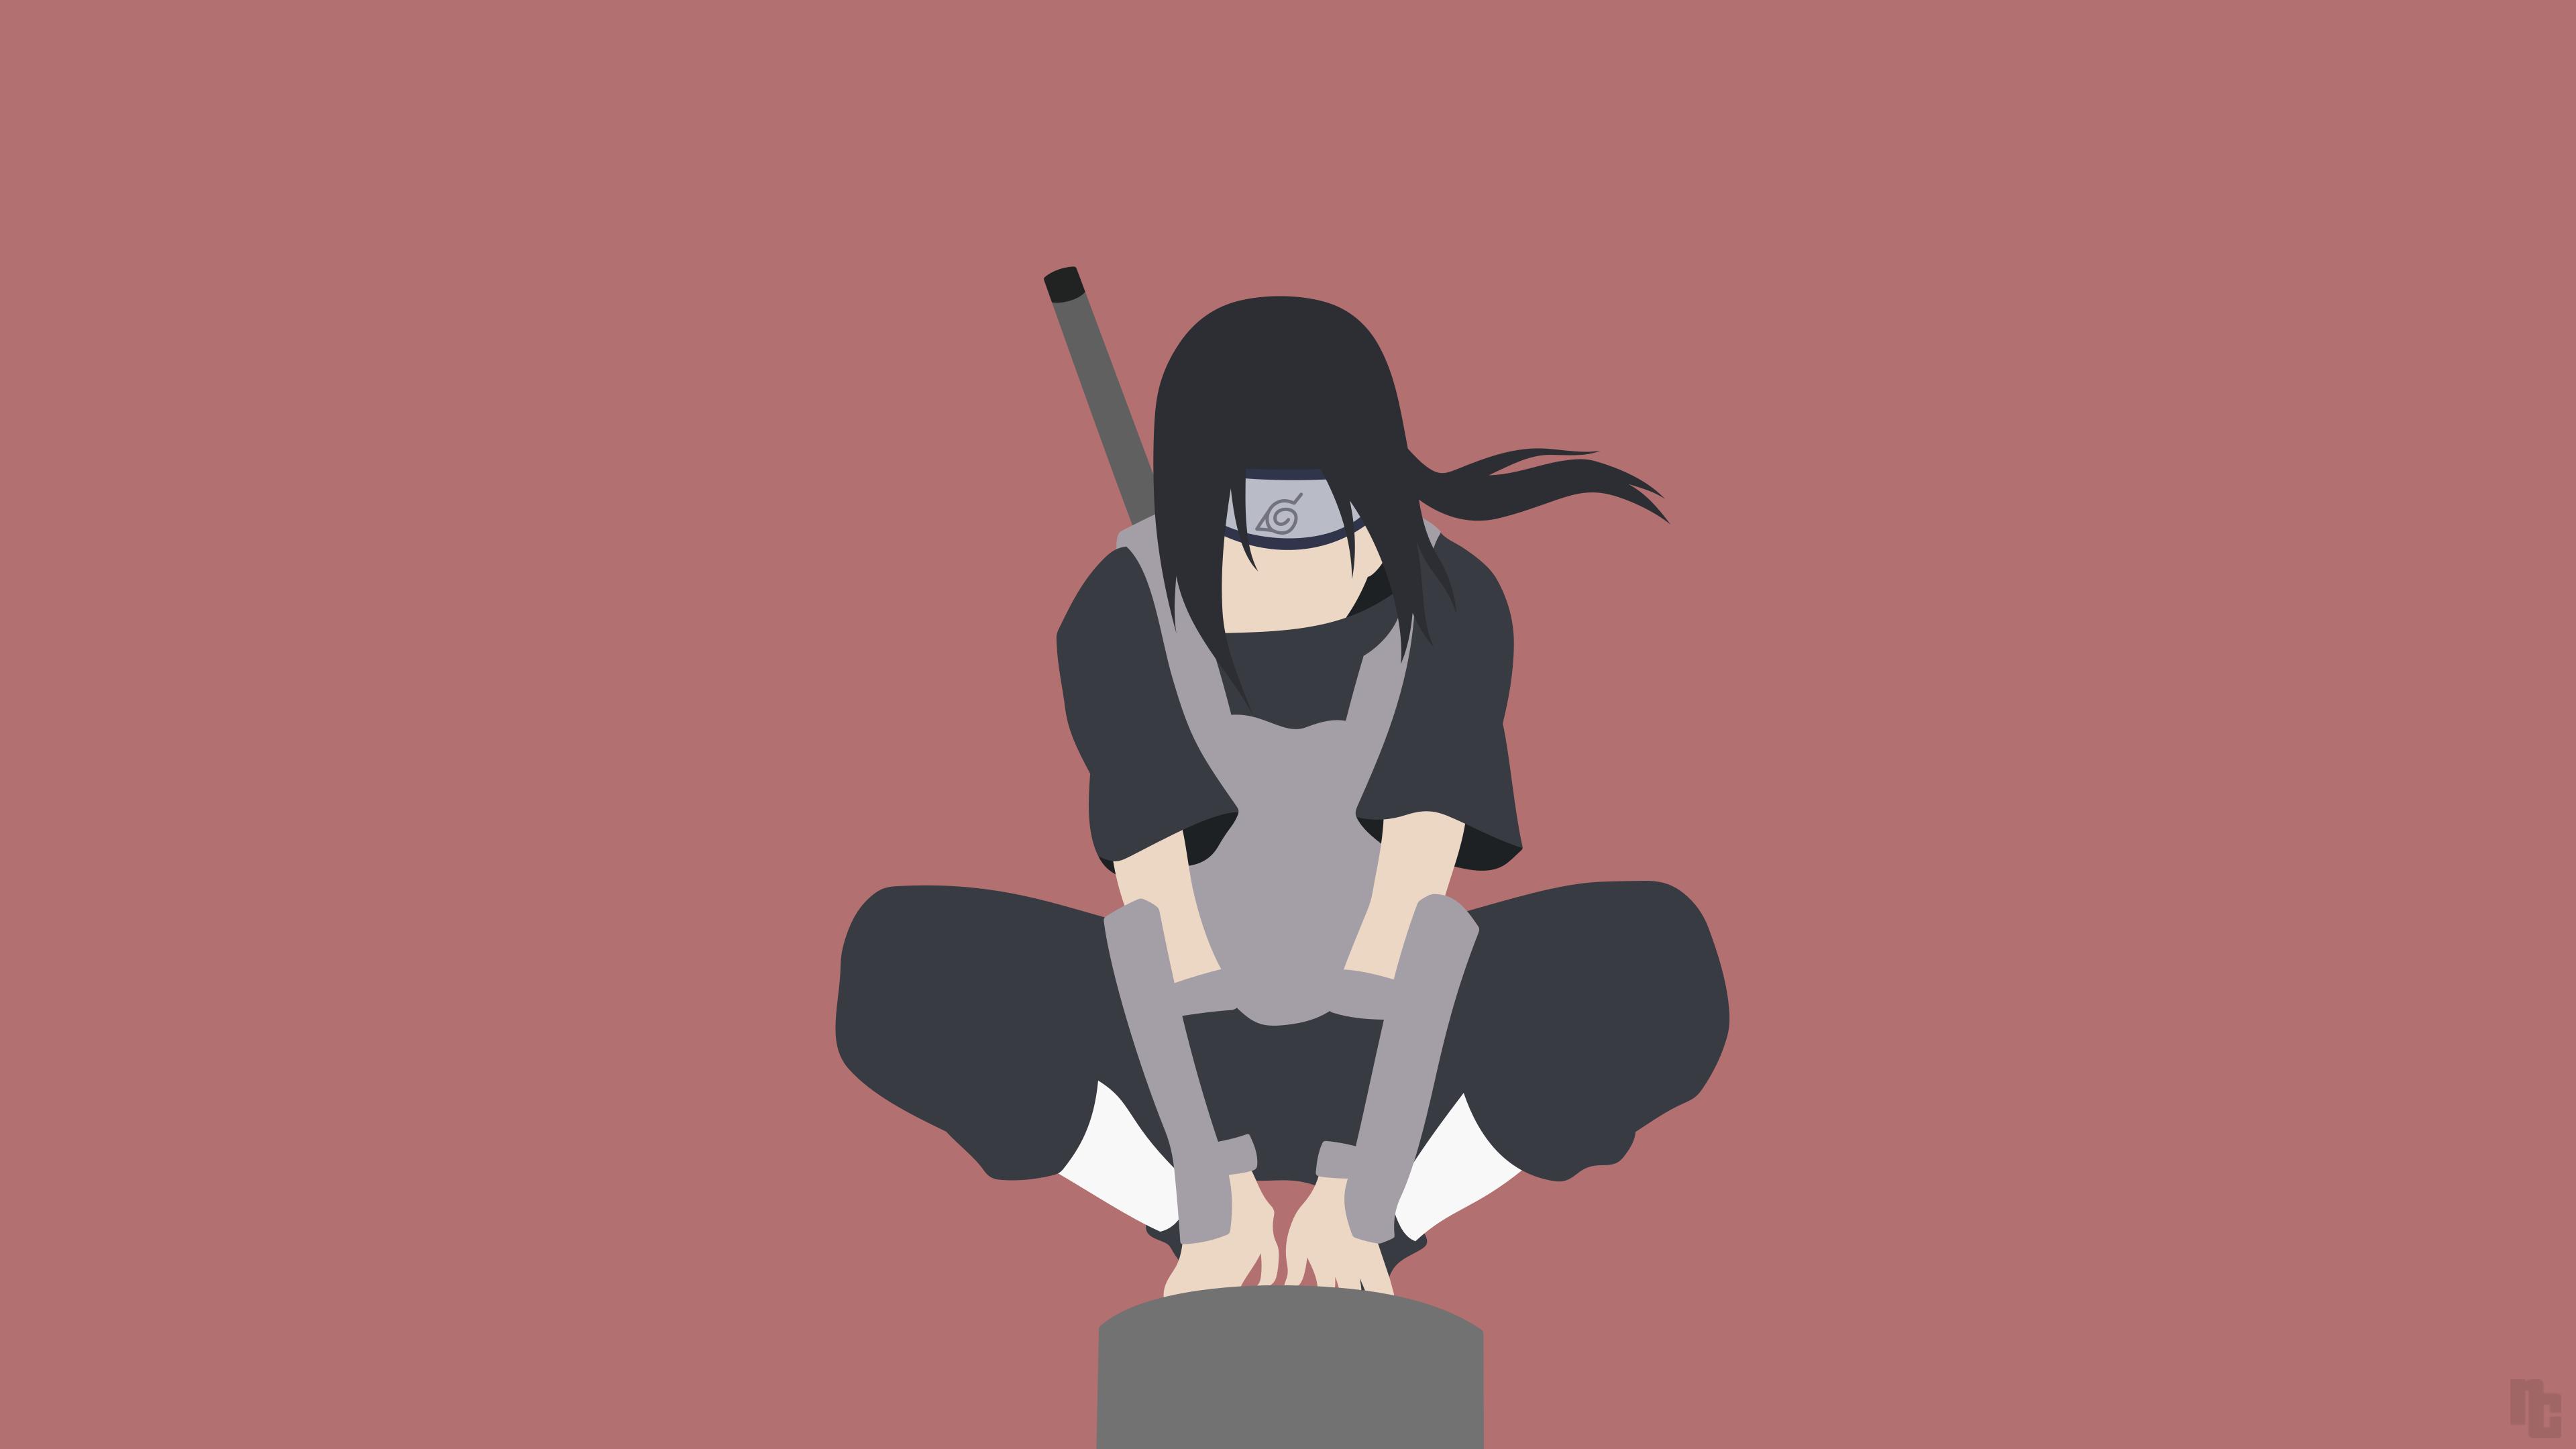 itachi wallpaper,cartoon,anime,illustration,animation,fictional character